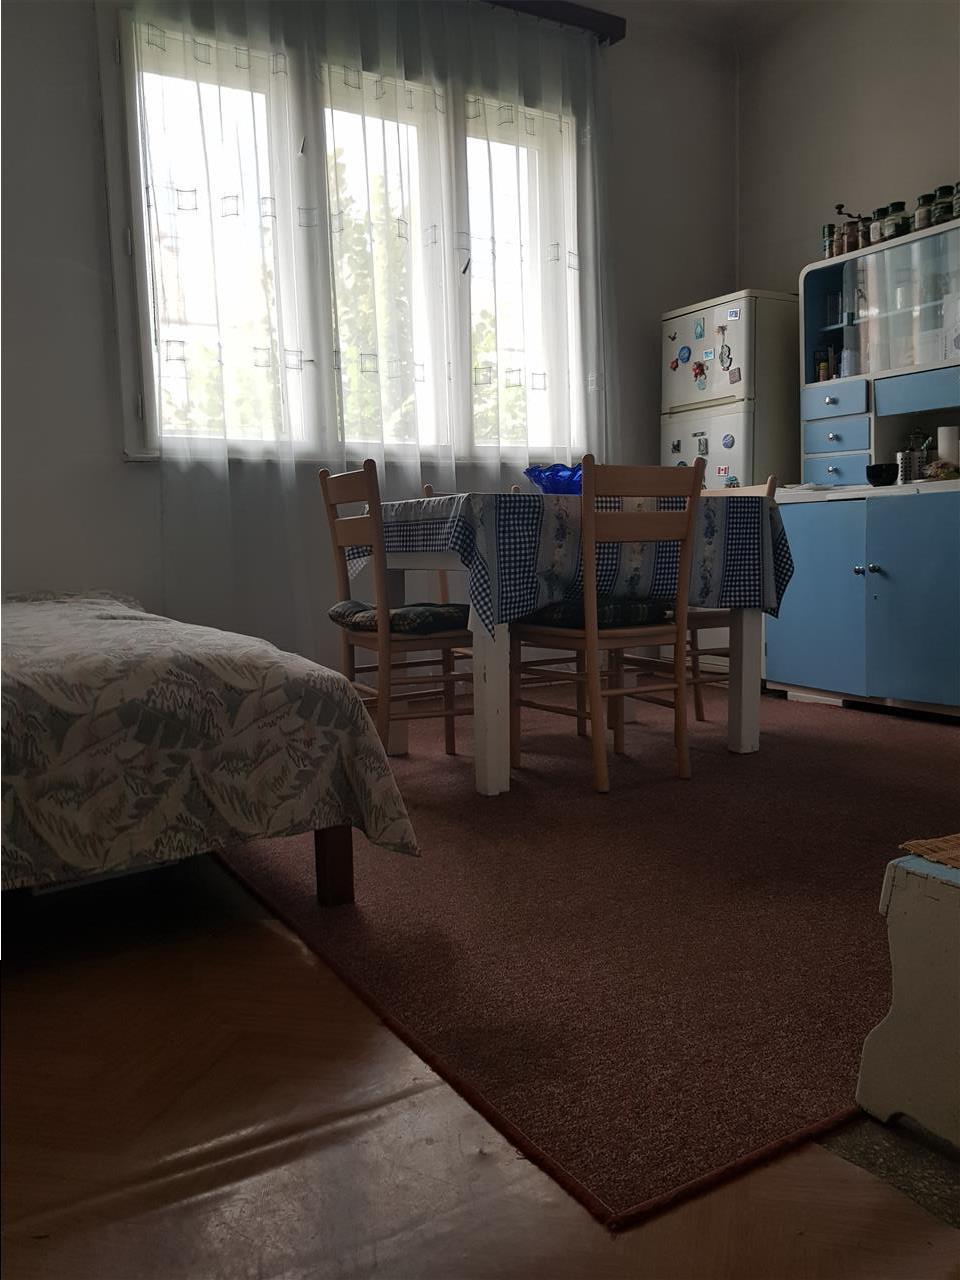 De vanzare casa, tip apartament Gheorghe Doja